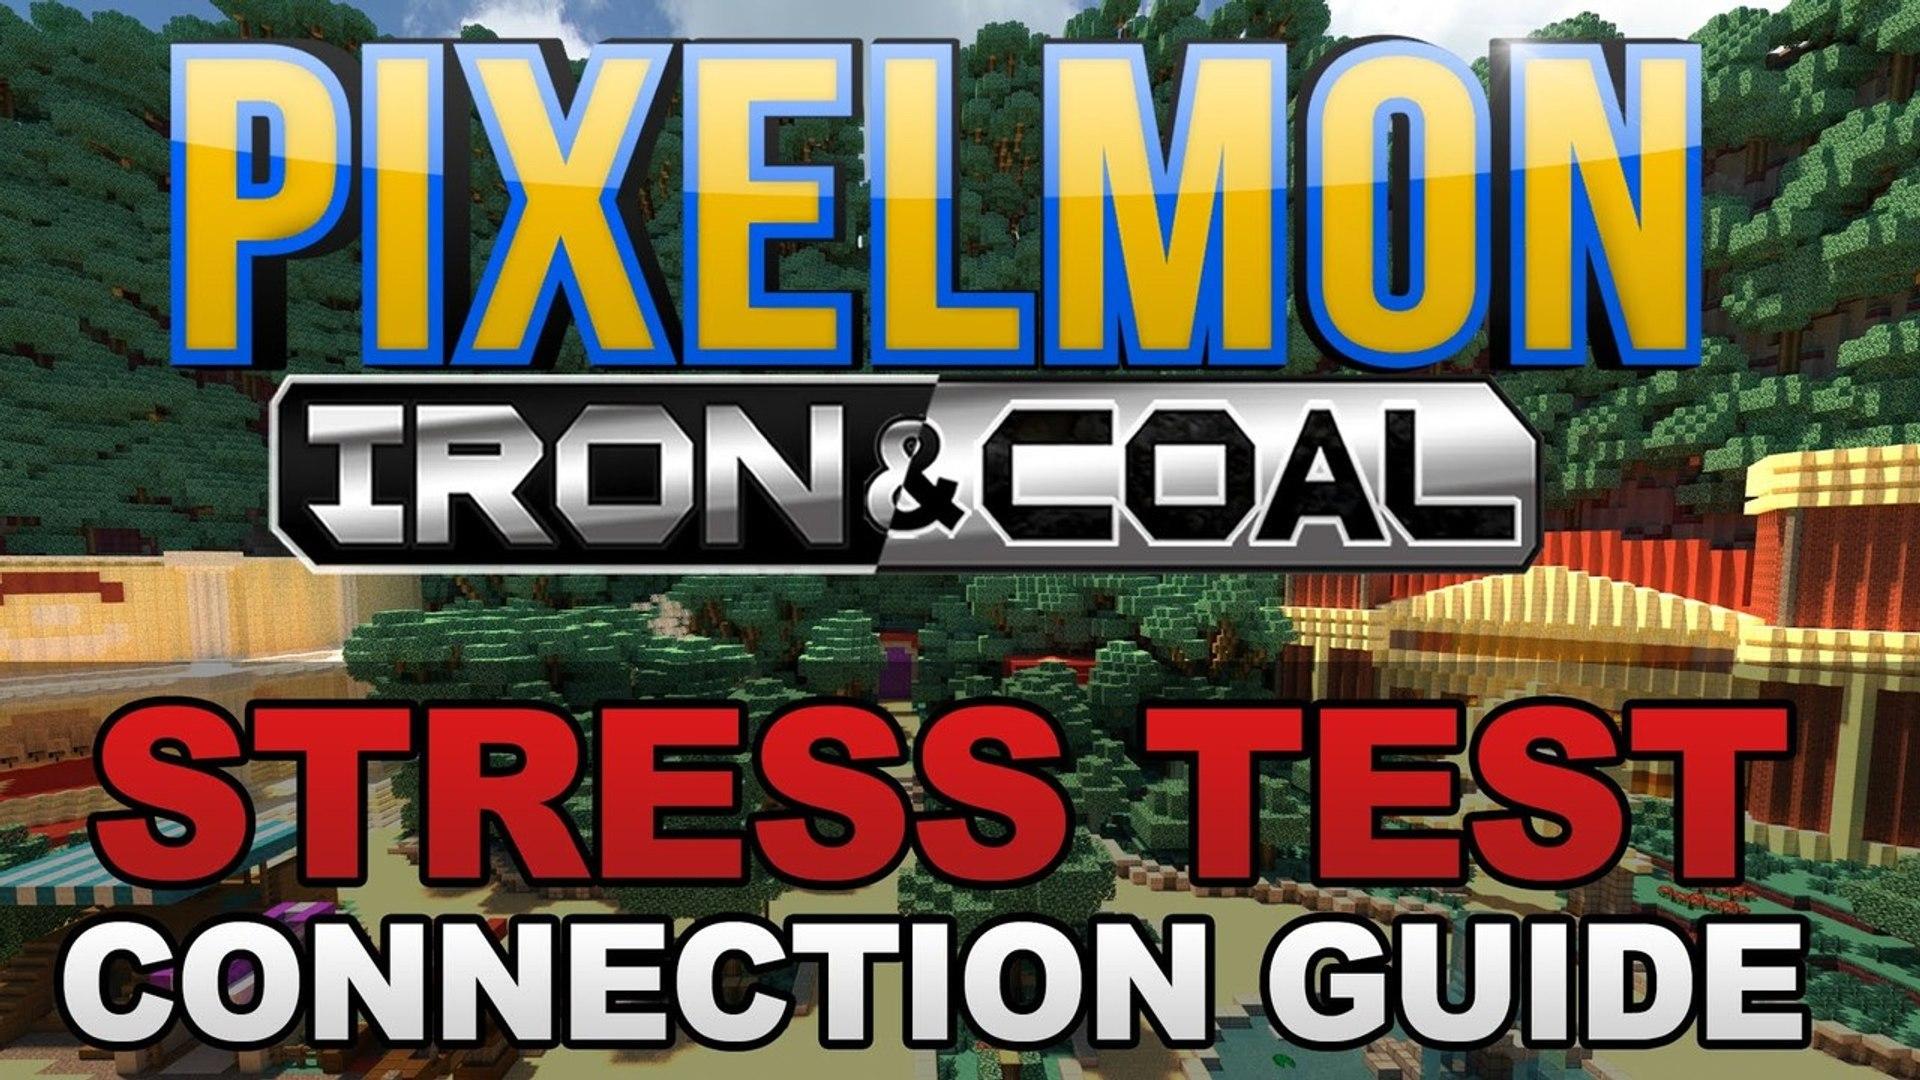 Iron & Coal Server [Stress Test] - Connection Tutorial